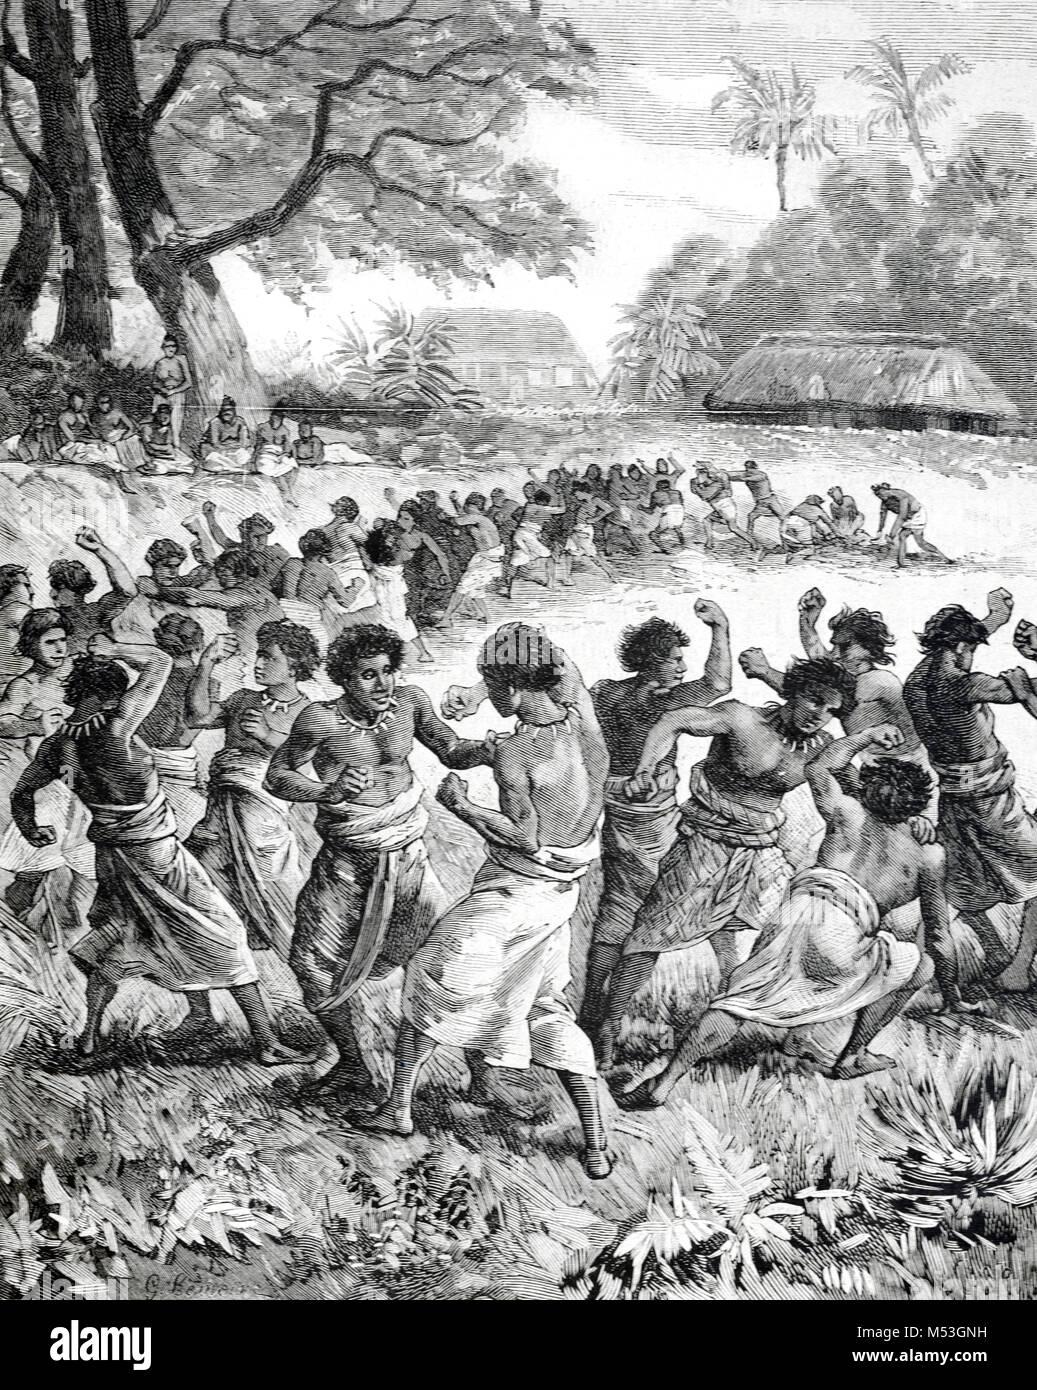 Gli uomini di Tongan boxe in Tonga, o il Regno di Tonga, Polinesia (incisione, 1988) Immagini Stock